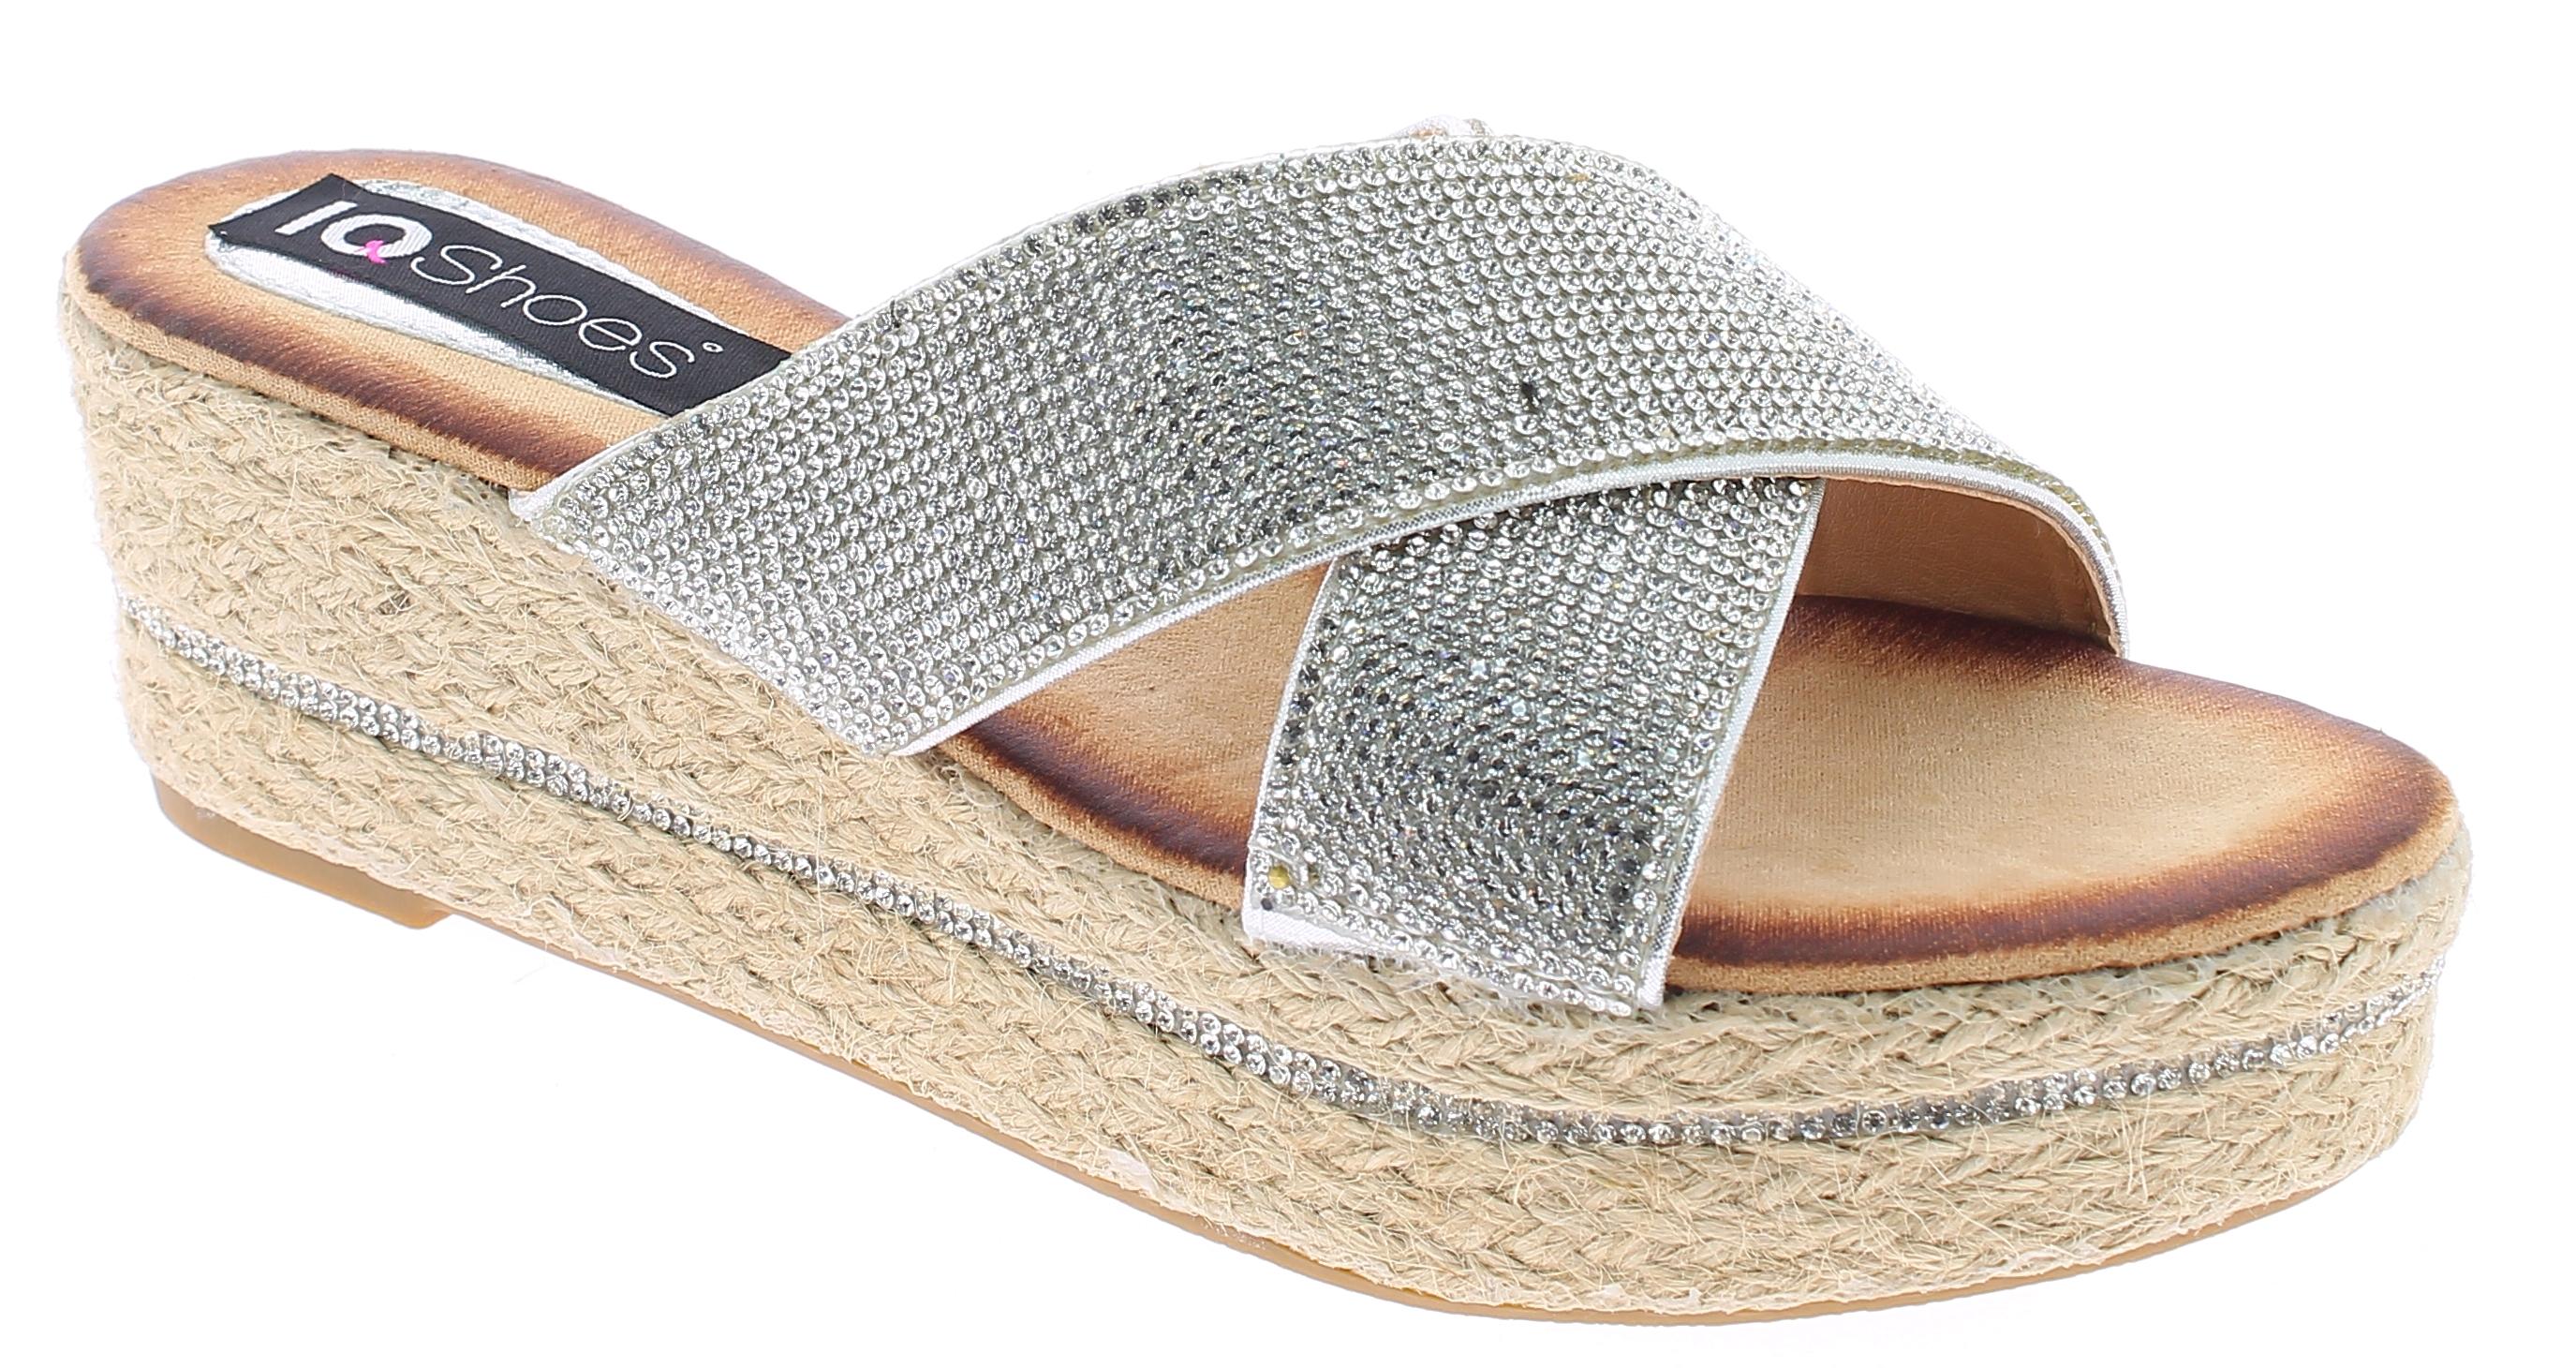 IQSHOES Γυναικεία Πλατφόρμα 1AE17197 Ασημί - IqShoes - 1AE-17197 SILVER-silver-3 παπούτσια  γυναικείες πλατφόρμες